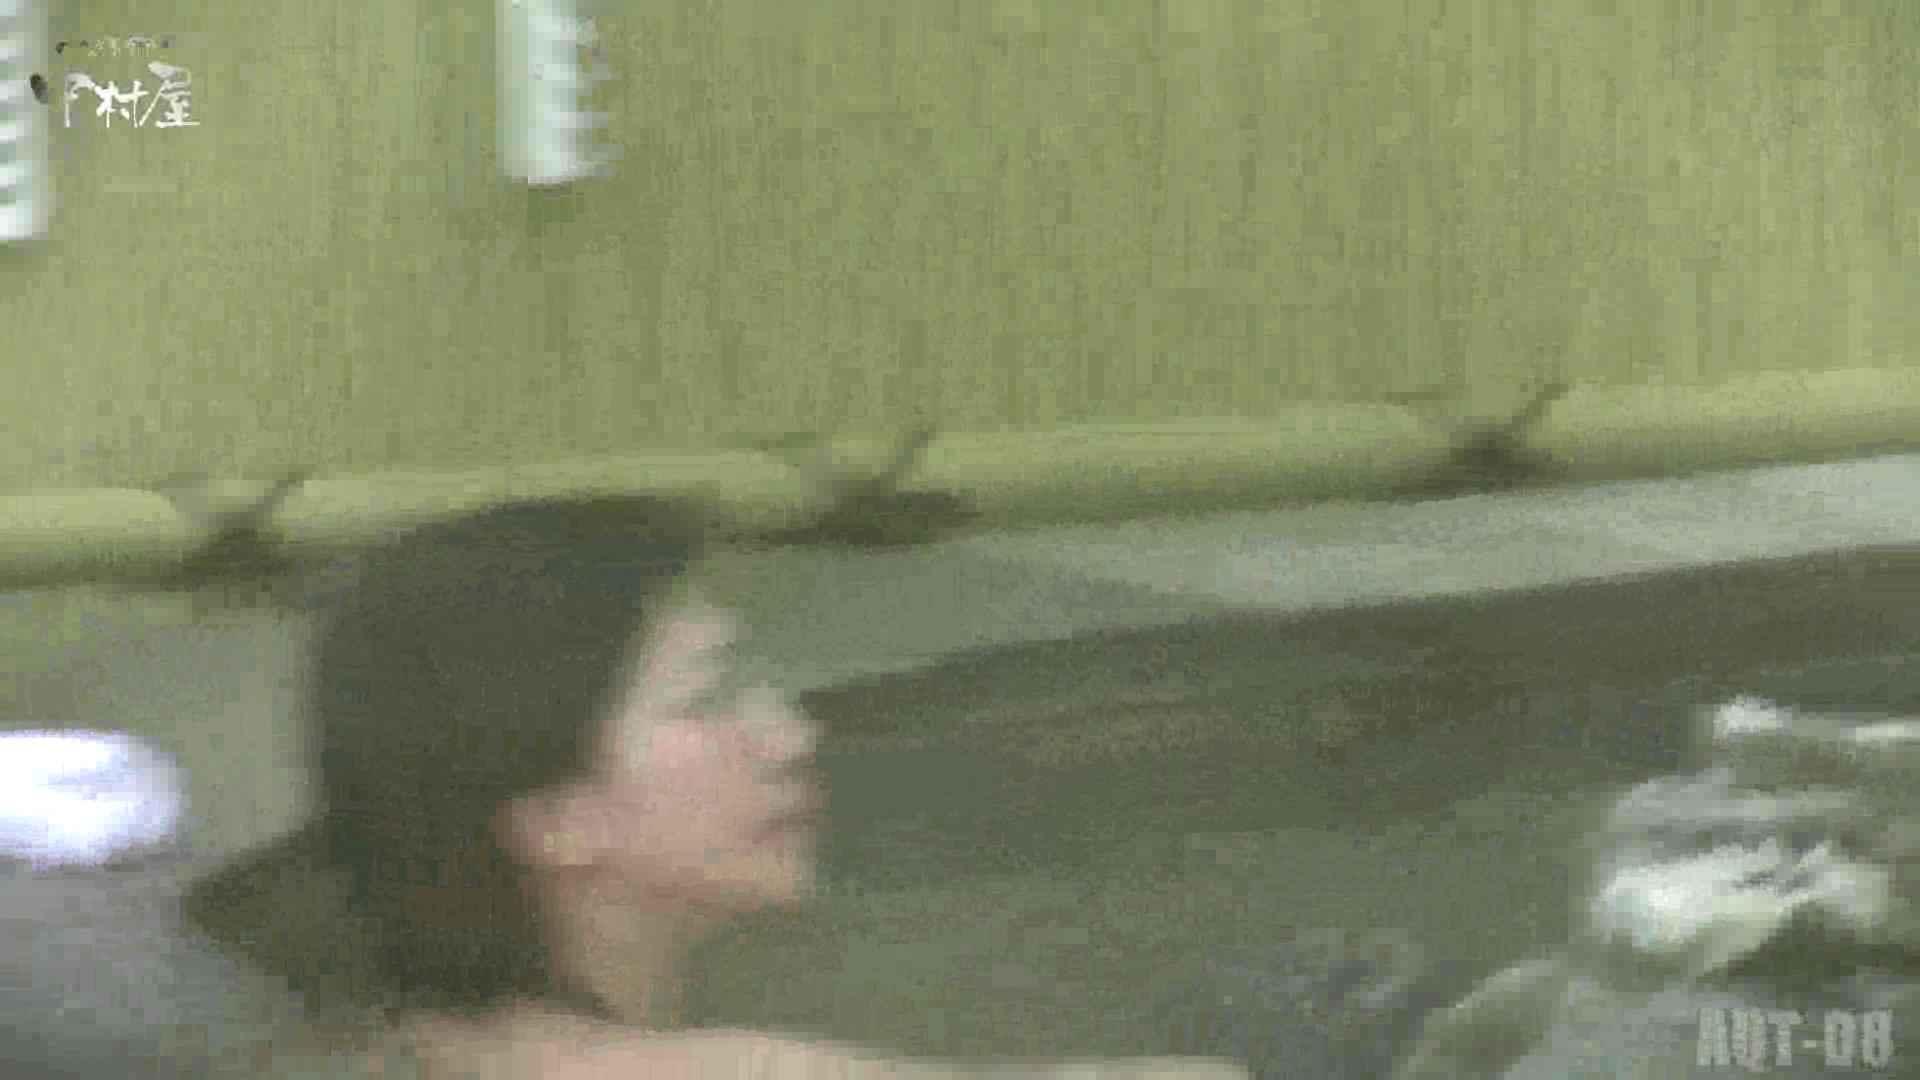 Aquaな露天風呂Vol.872潜入盗撮露天風呂八判湯 其の四 OL女体 | 女体盗撮  92連発 77